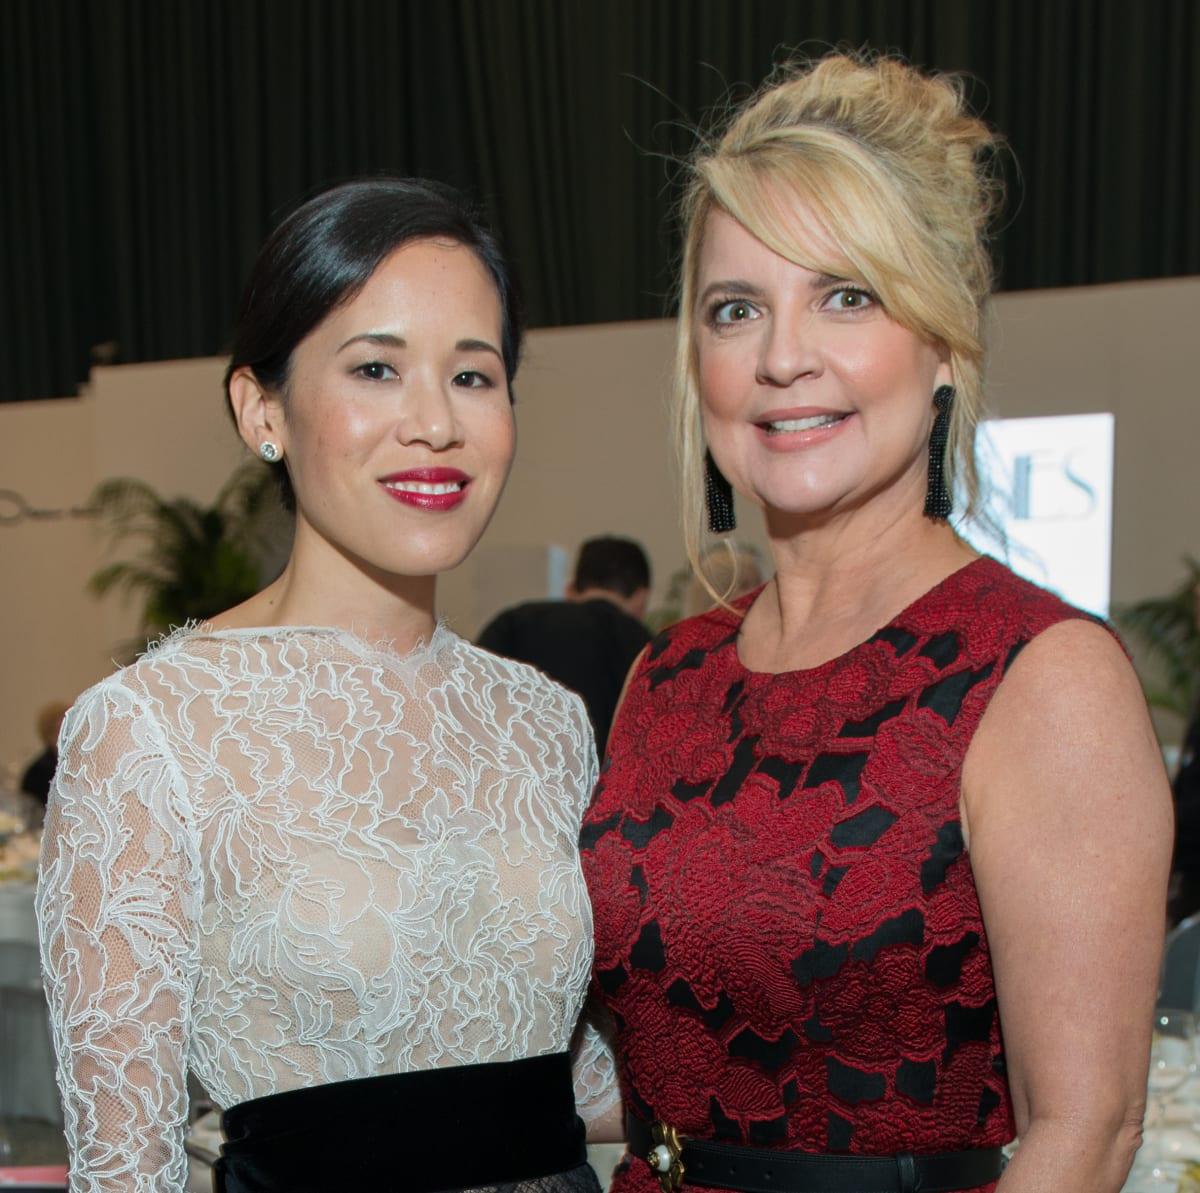 Stephanie Fleck, Melissa Juneau at Oscar de la Renta fashion show at MFAH